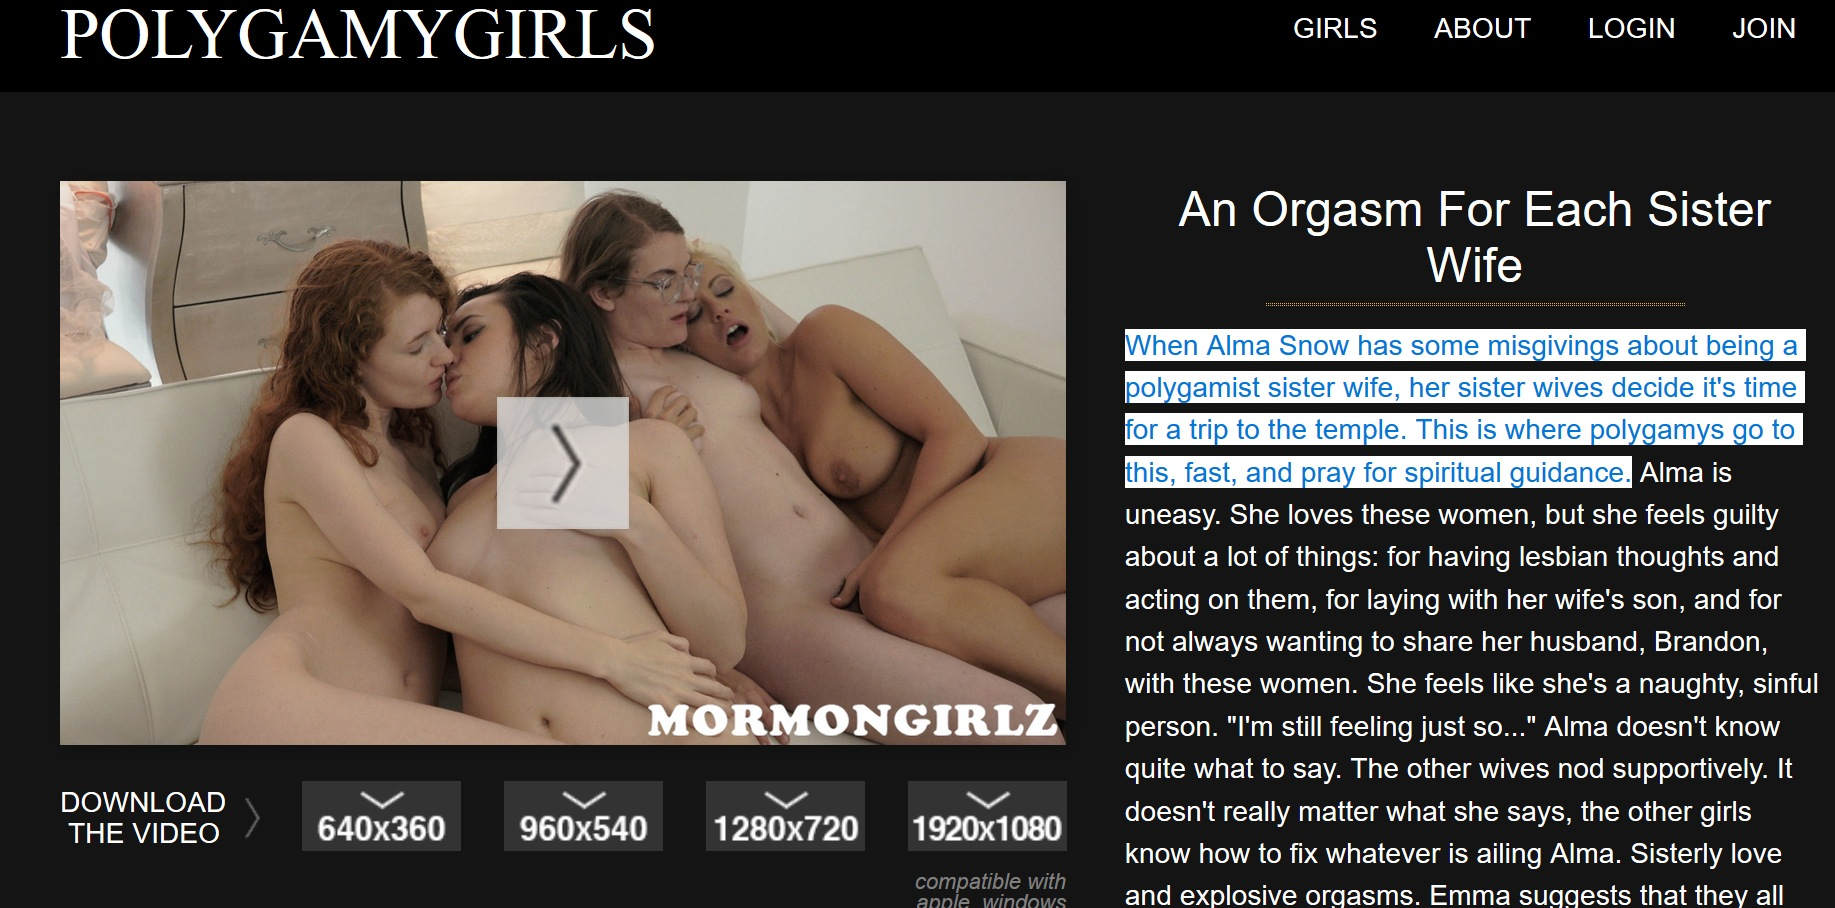 preview image password  for polygamygirls.com